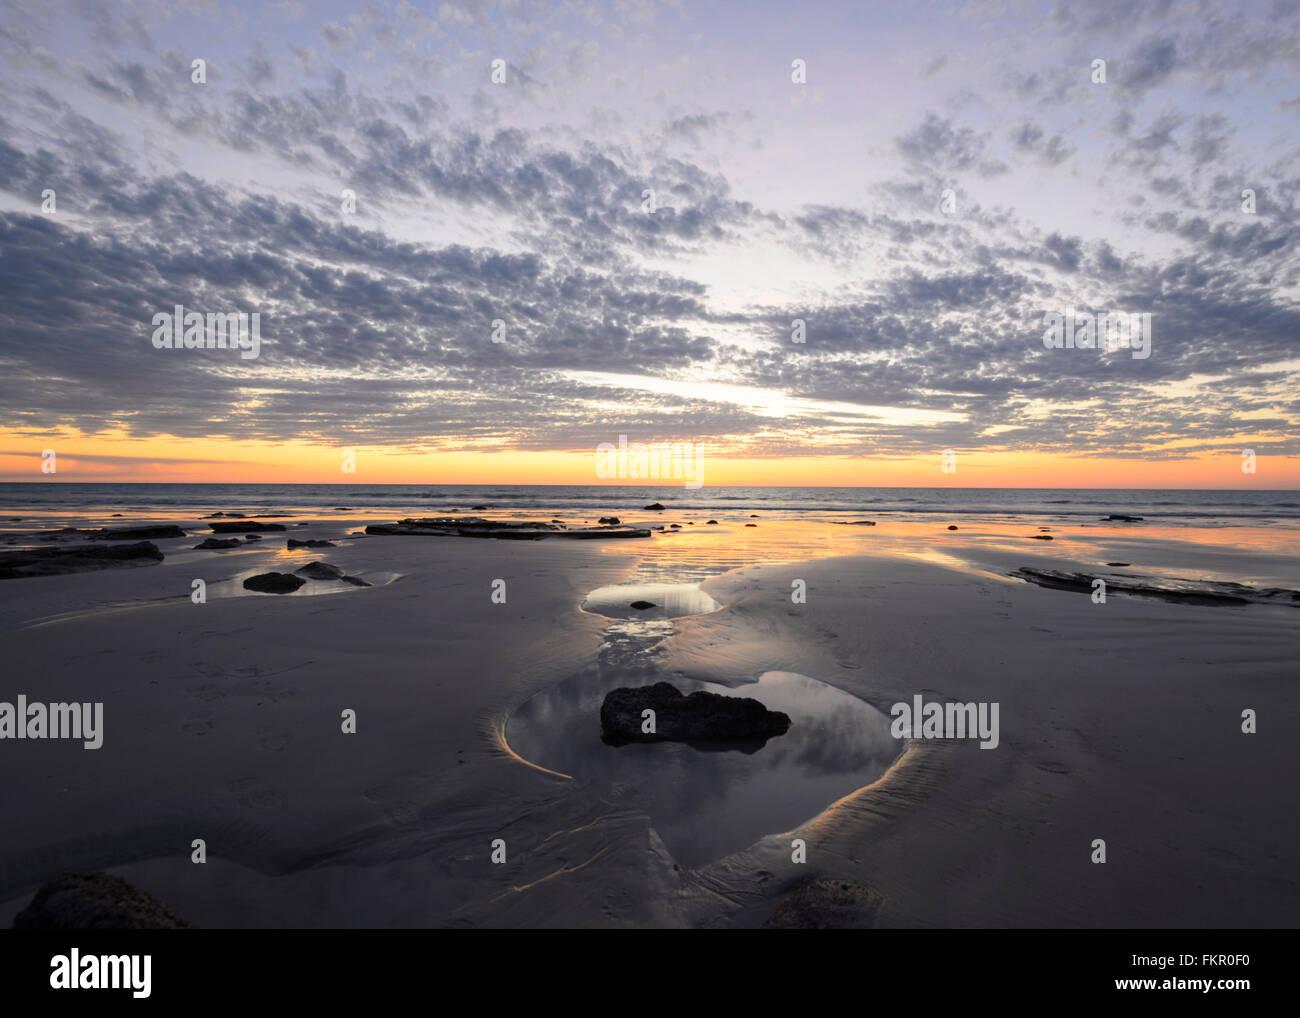 Sonnenuntergang, Cable Beach, Broome, Kimberley-Region, Western Australia, WA, Australien Stockbild